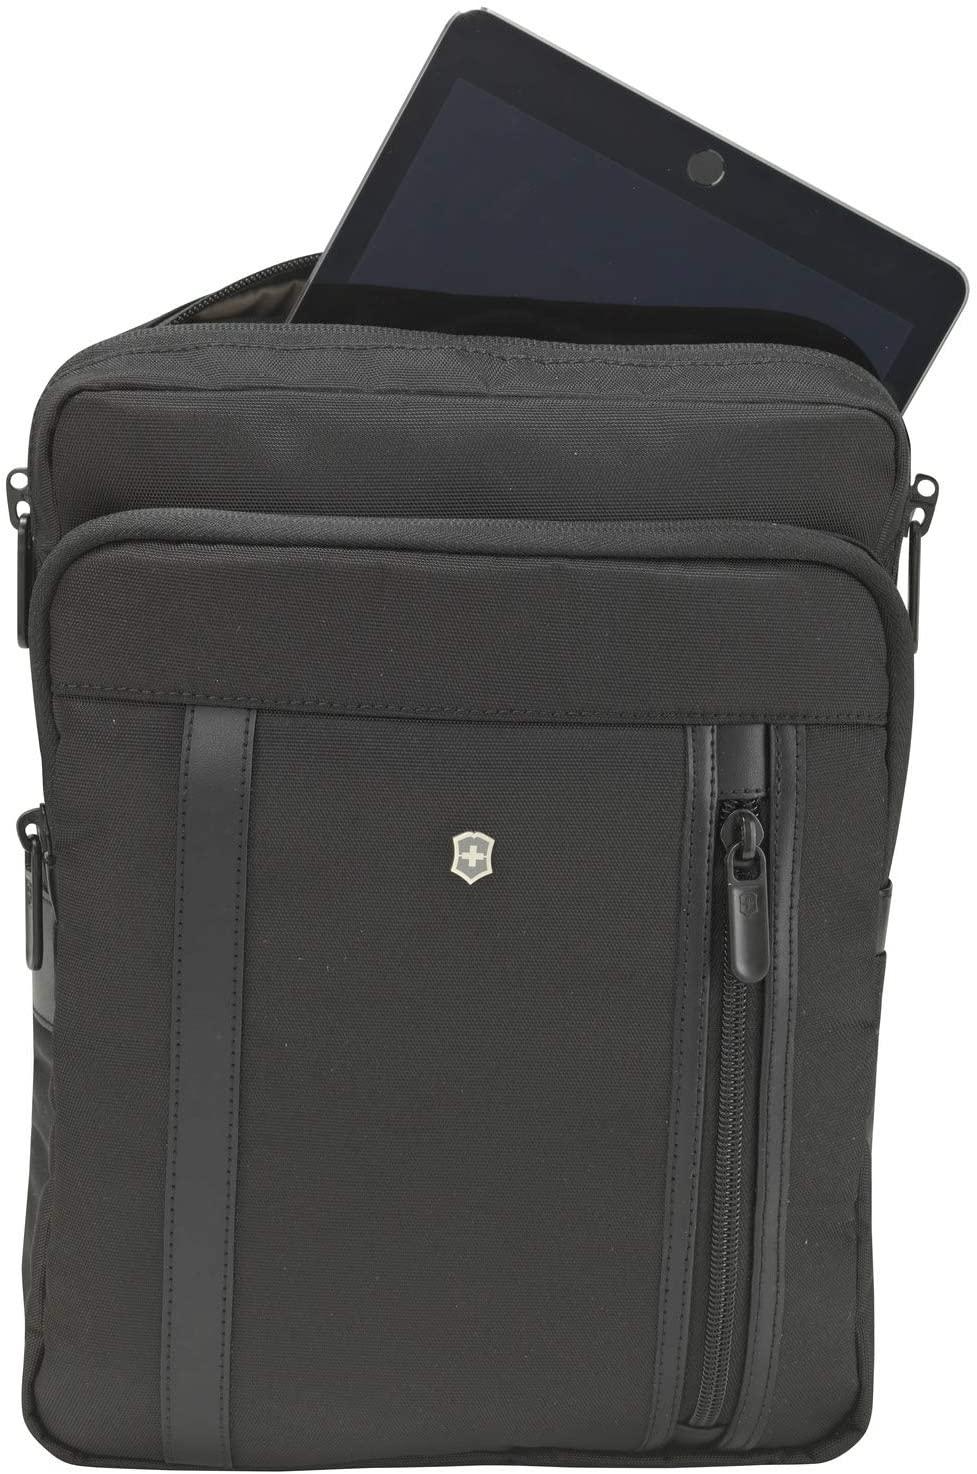 Victorinox Werks Professional 2.0 Crossbody Laptop Bag, Black, 12.6-inch